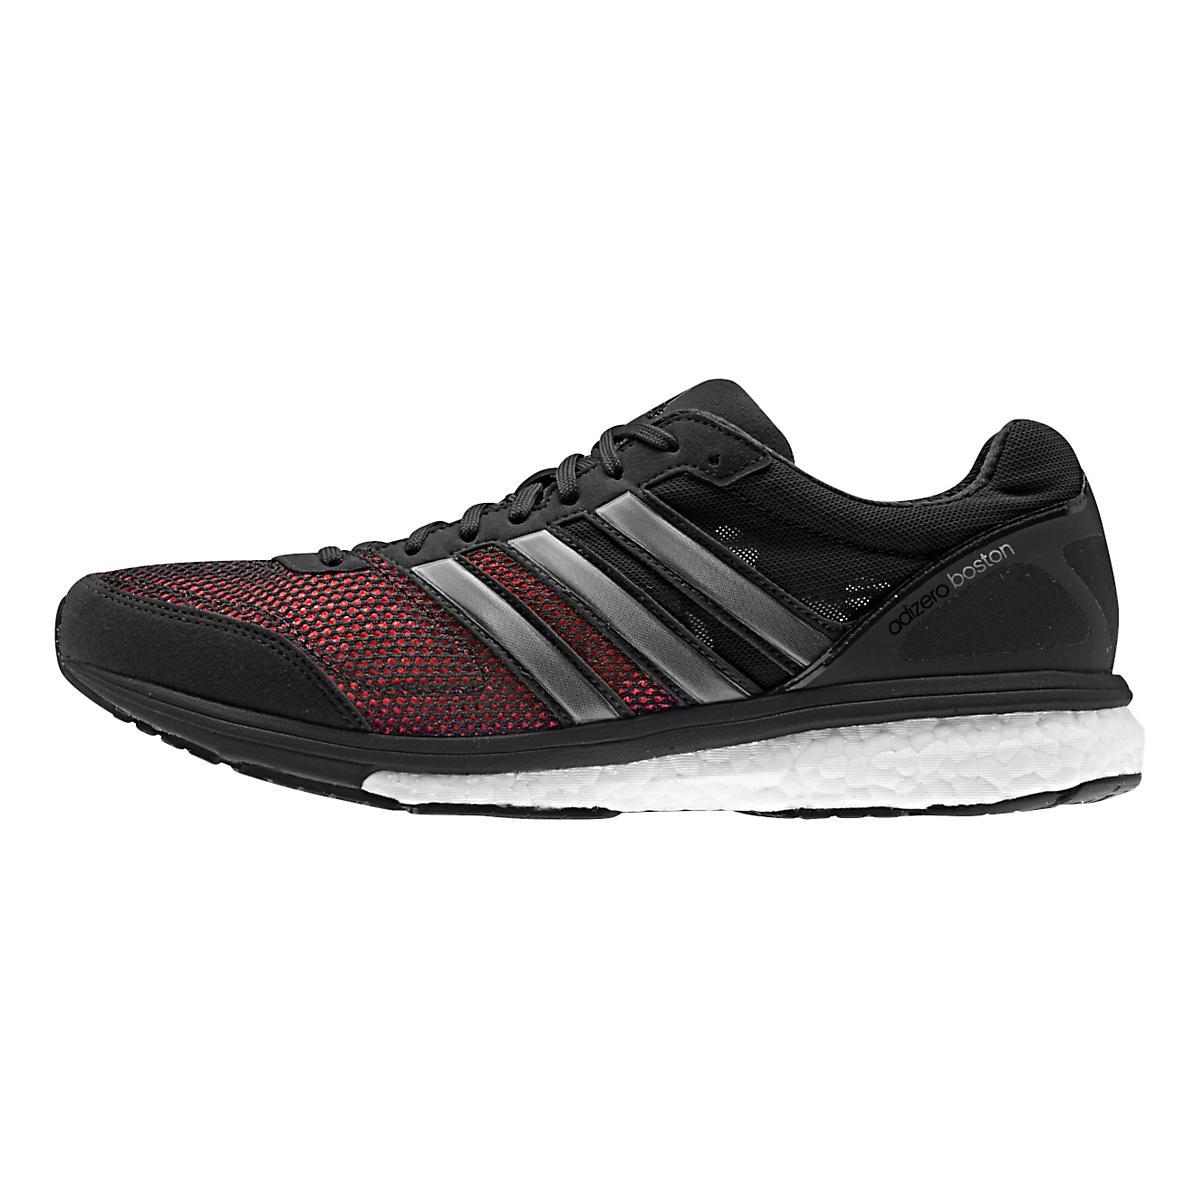 Mens adidas Adizero Boston 5 Boost Running Shoe at Road